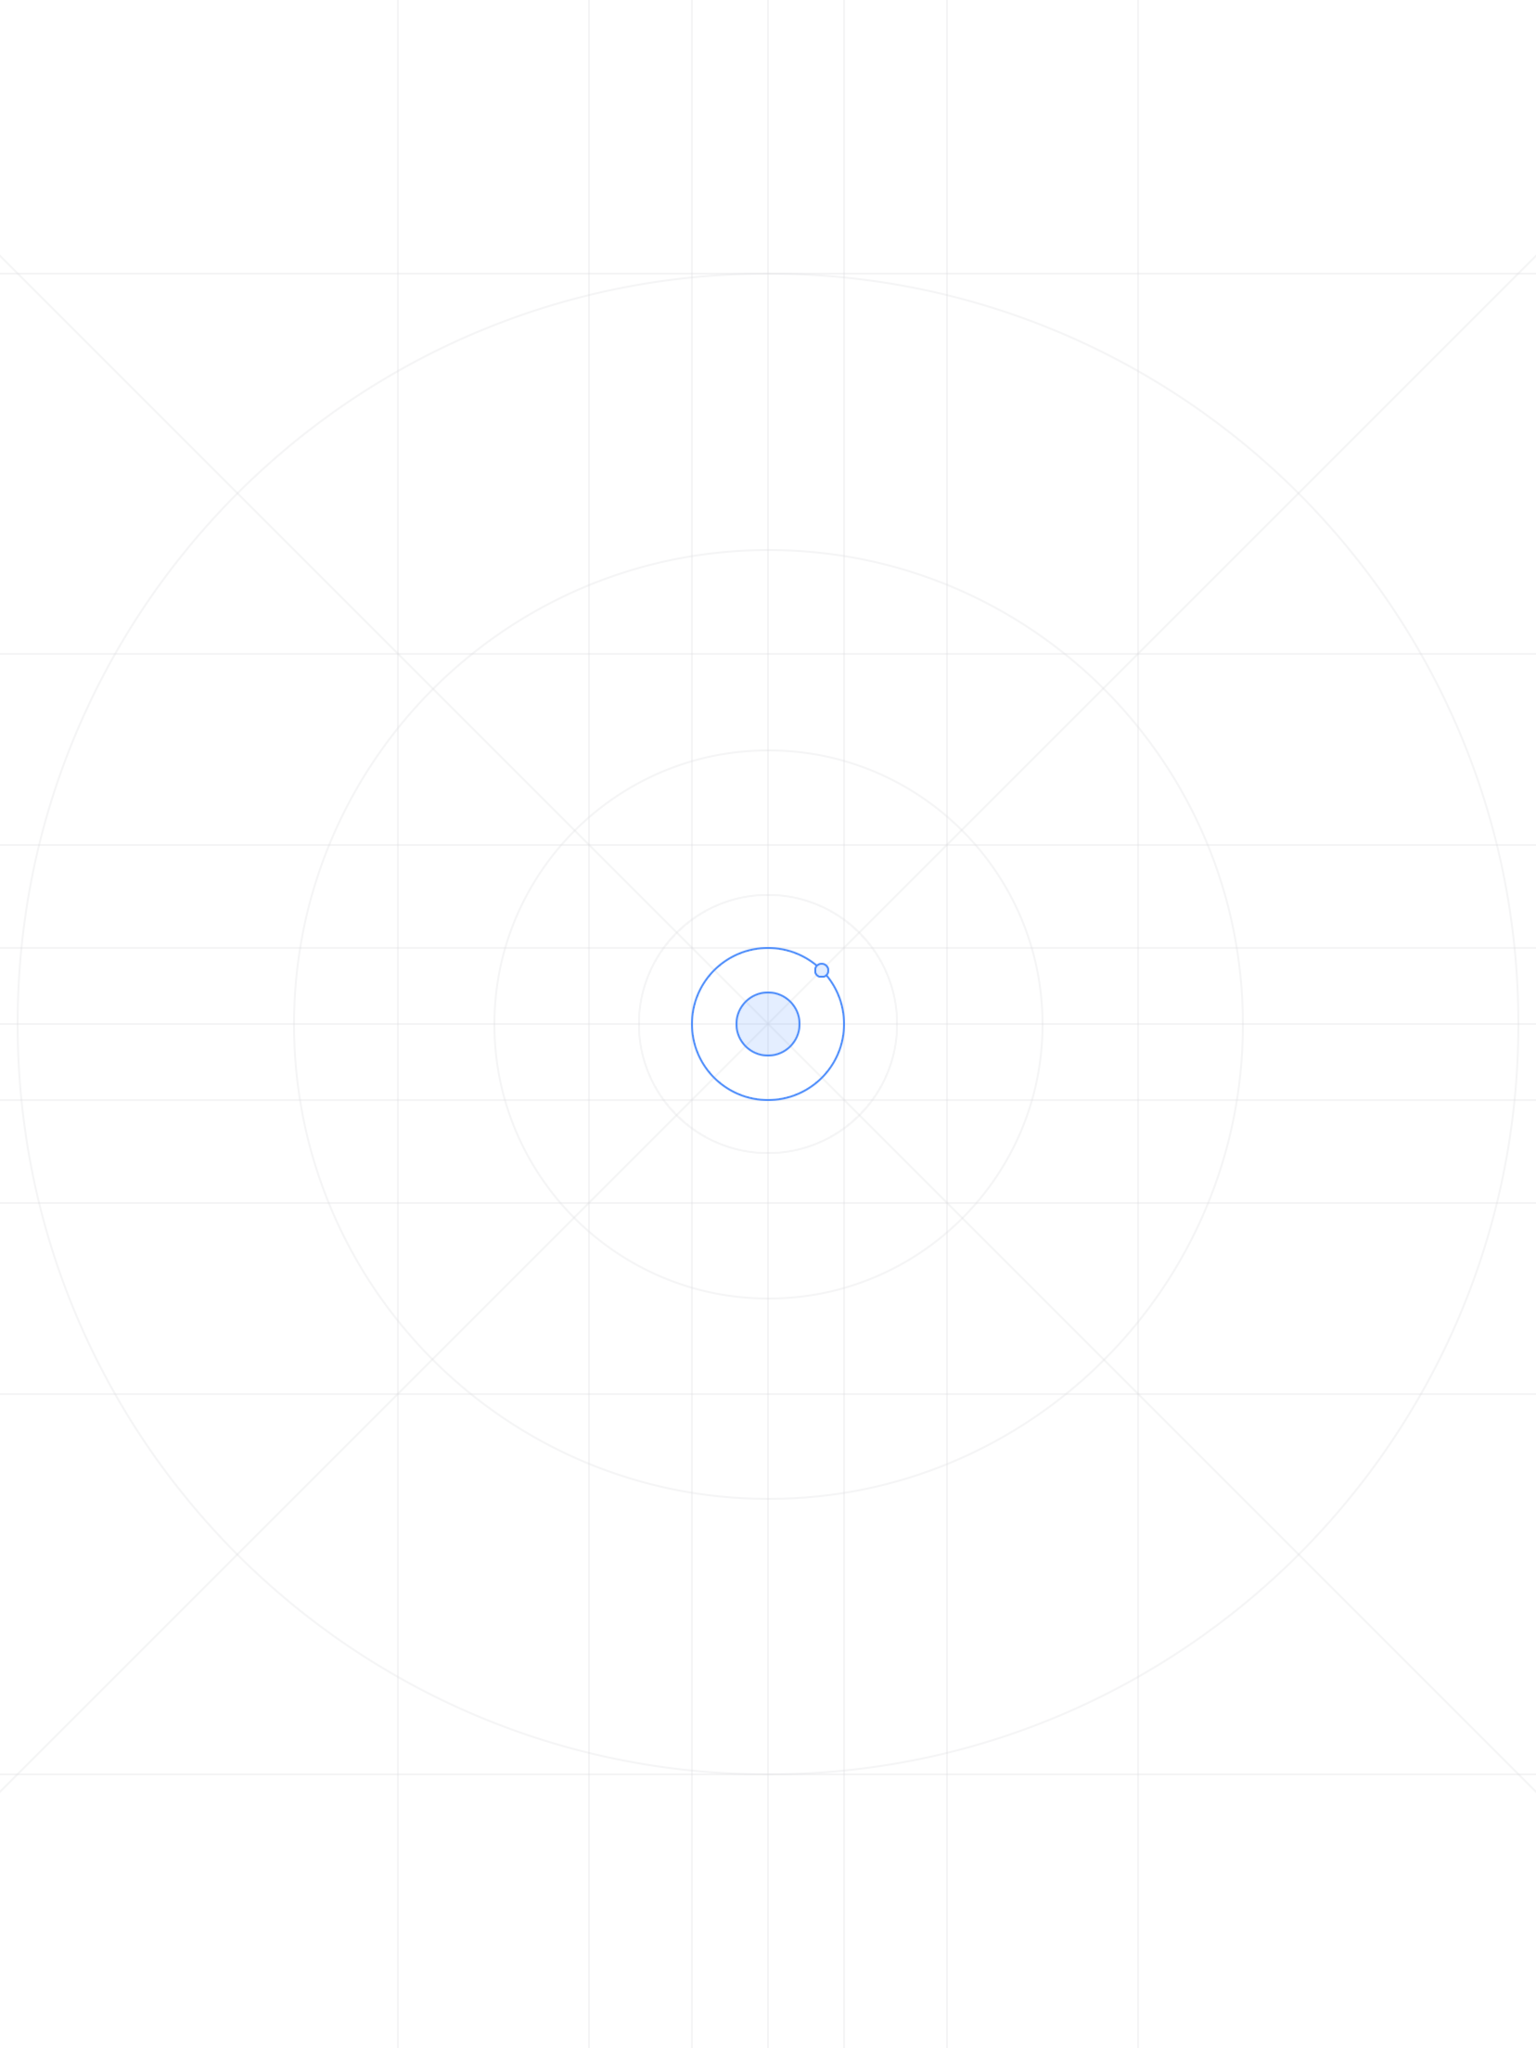 klu5/resources/ios/splash/Default-Portrait@2x~ipad.png